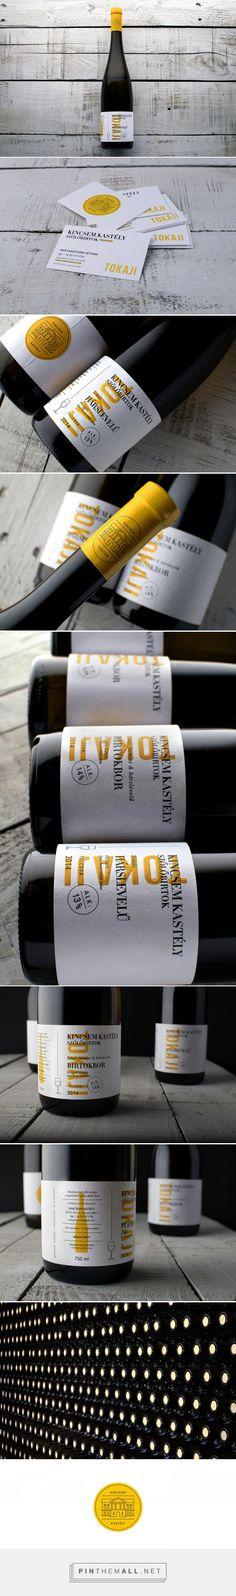 Kincsem Kastély Winery Packaging by Kissmiklos | Fivestar Branding Agency – Design and Branding Agency & Curated Inspiration Gallery